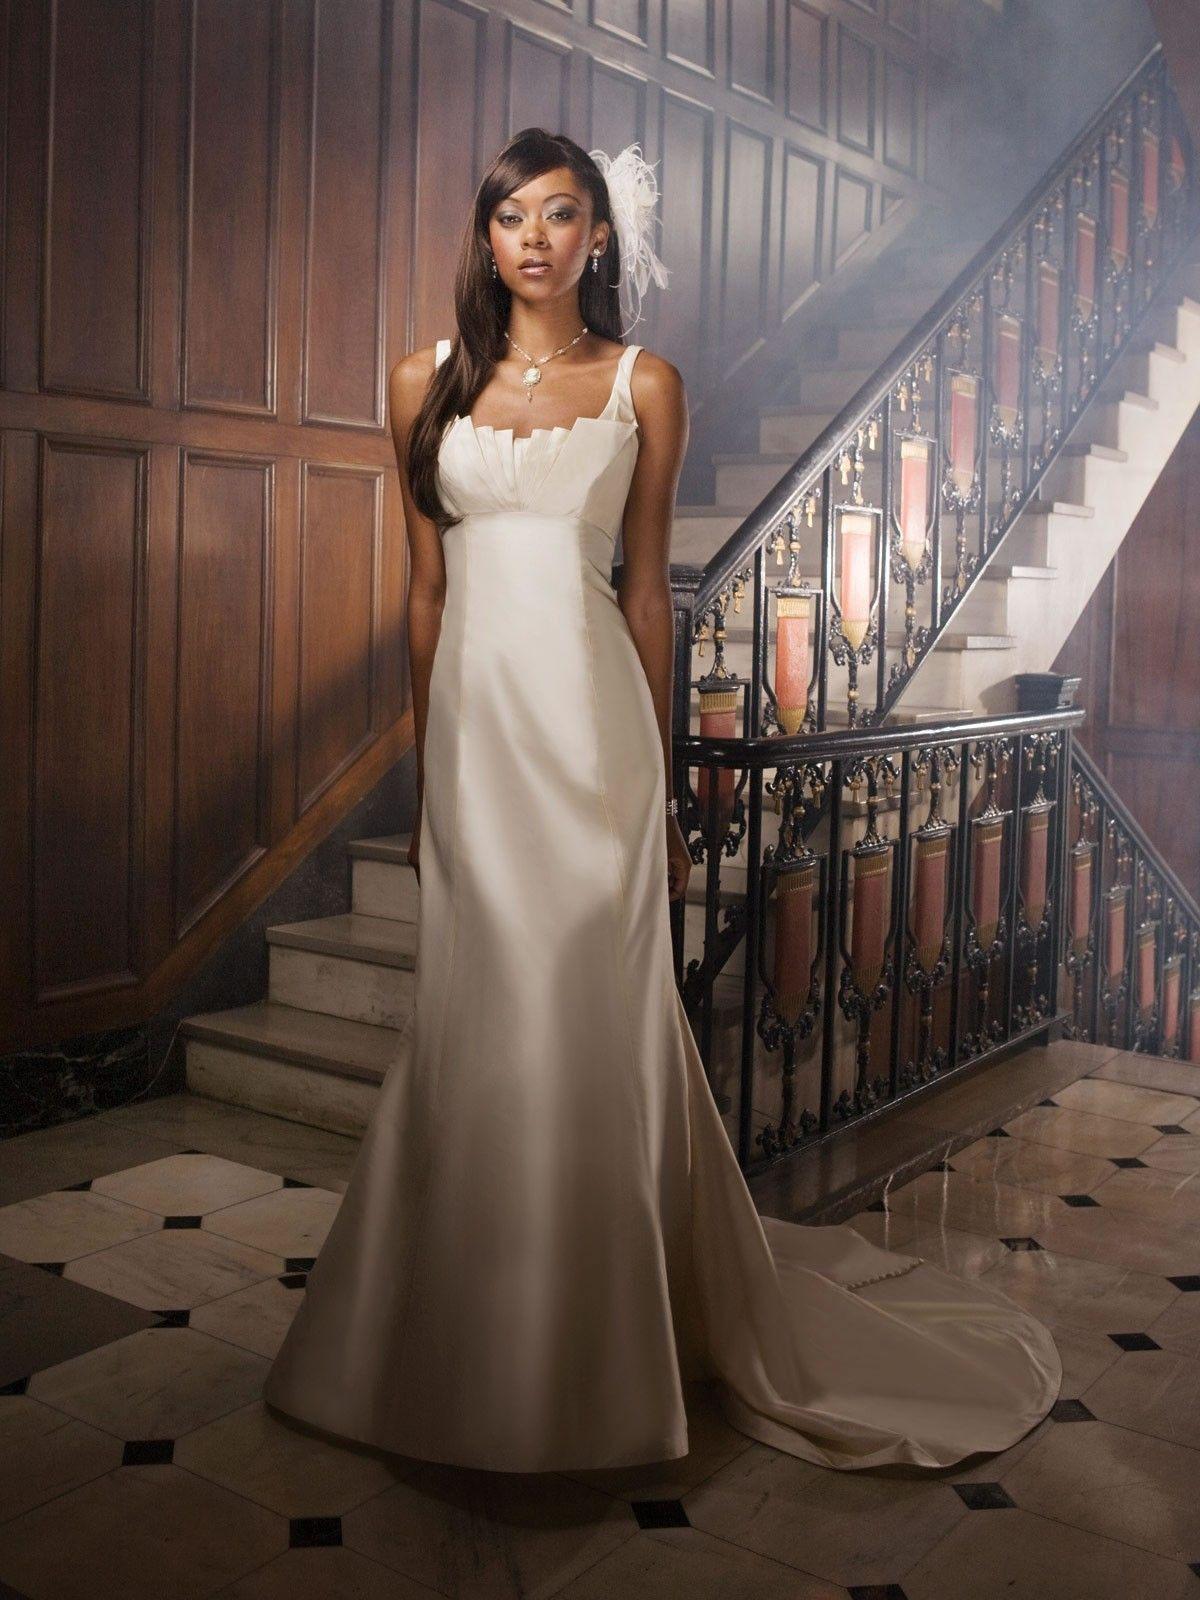 Unique style wedding dresses  Shantung Square Neckline Origami Pleated Bodice Aline Wedding Dress